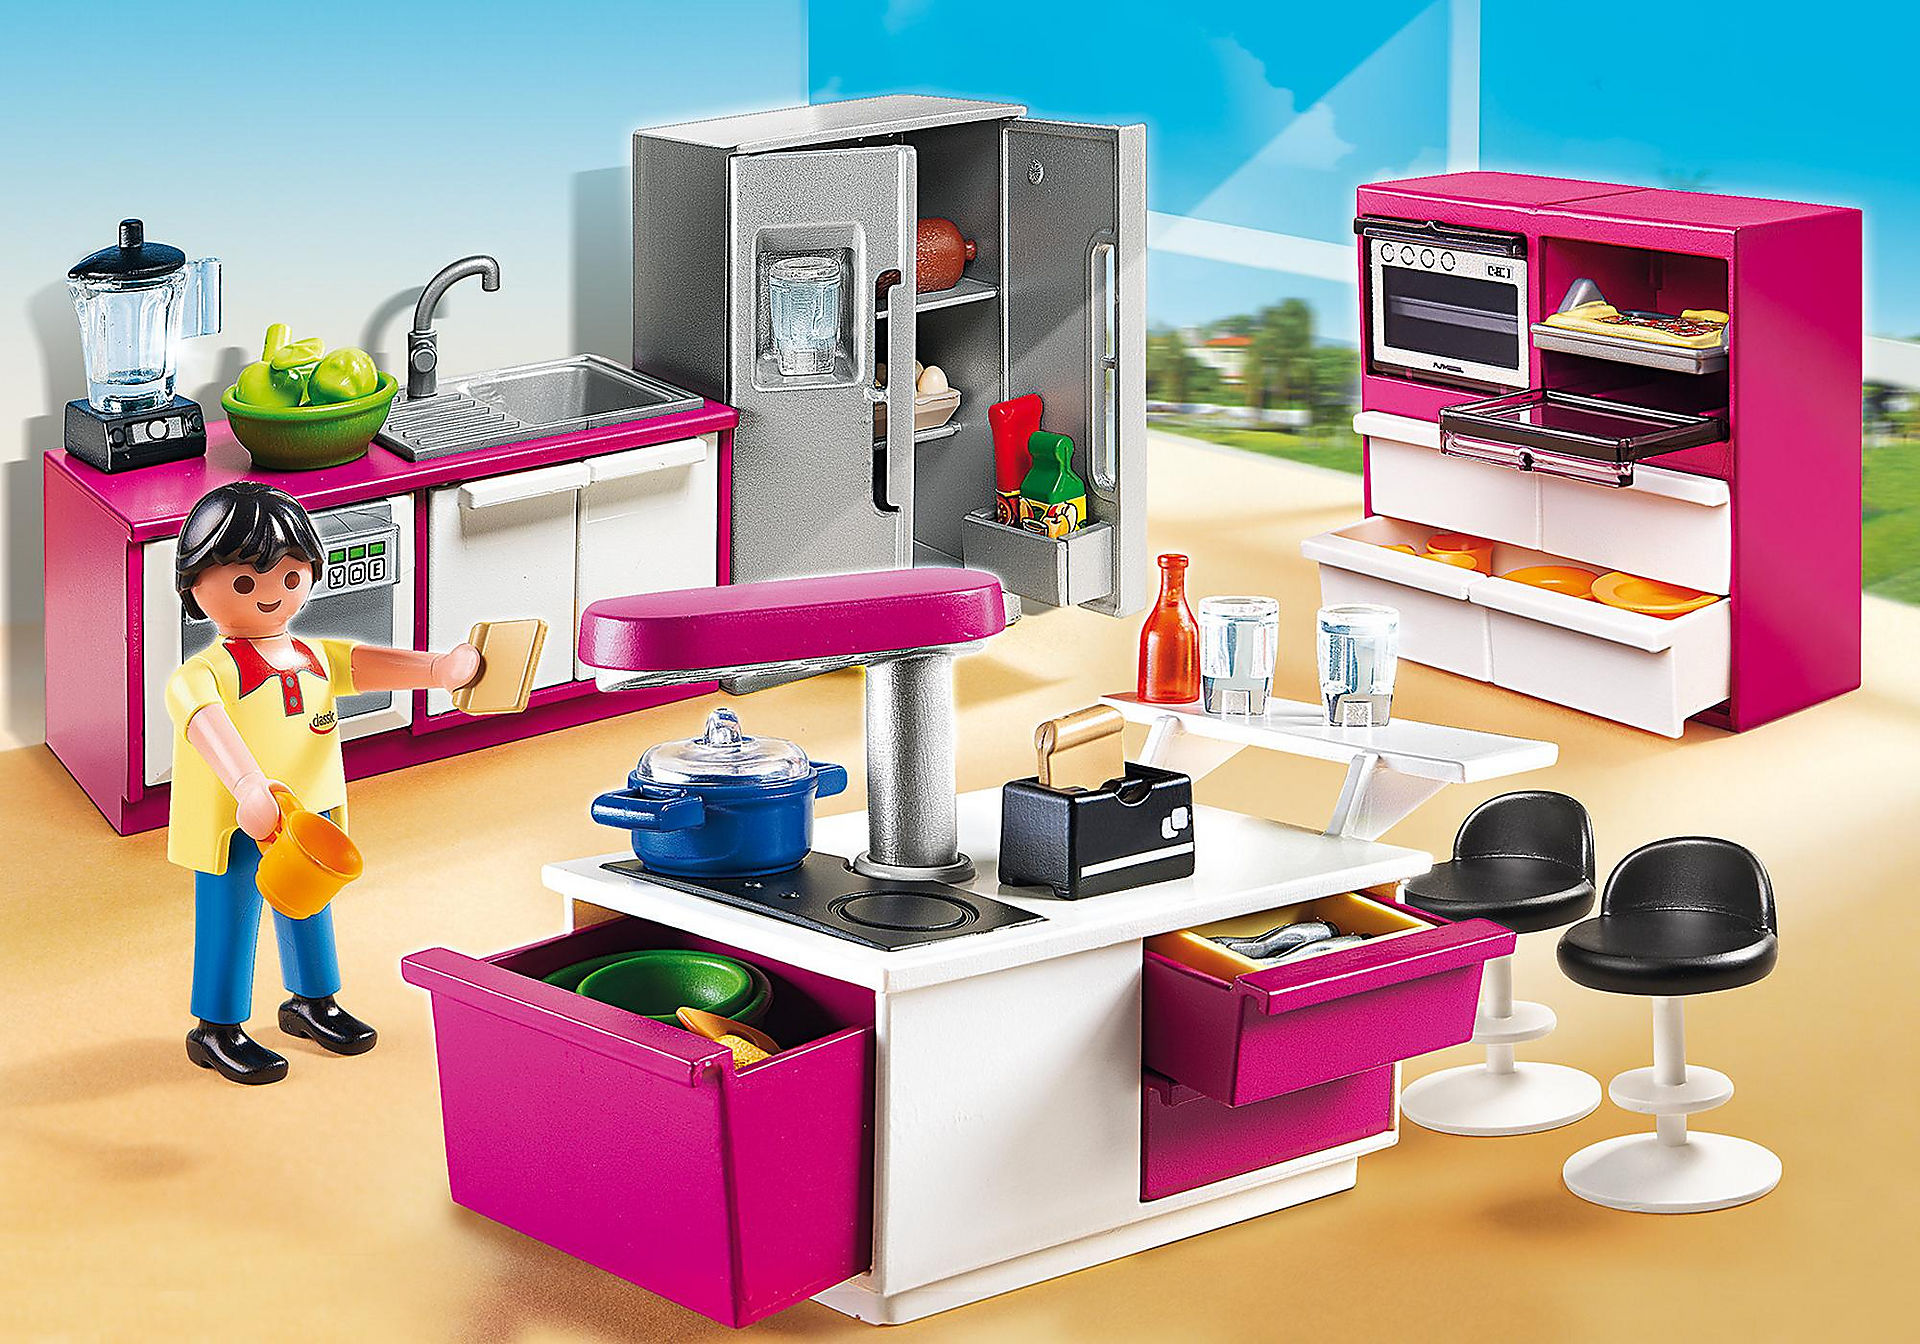 http://media.playmobil.com/i/playmobil/5582_product_detail/Cuisine avec îlot